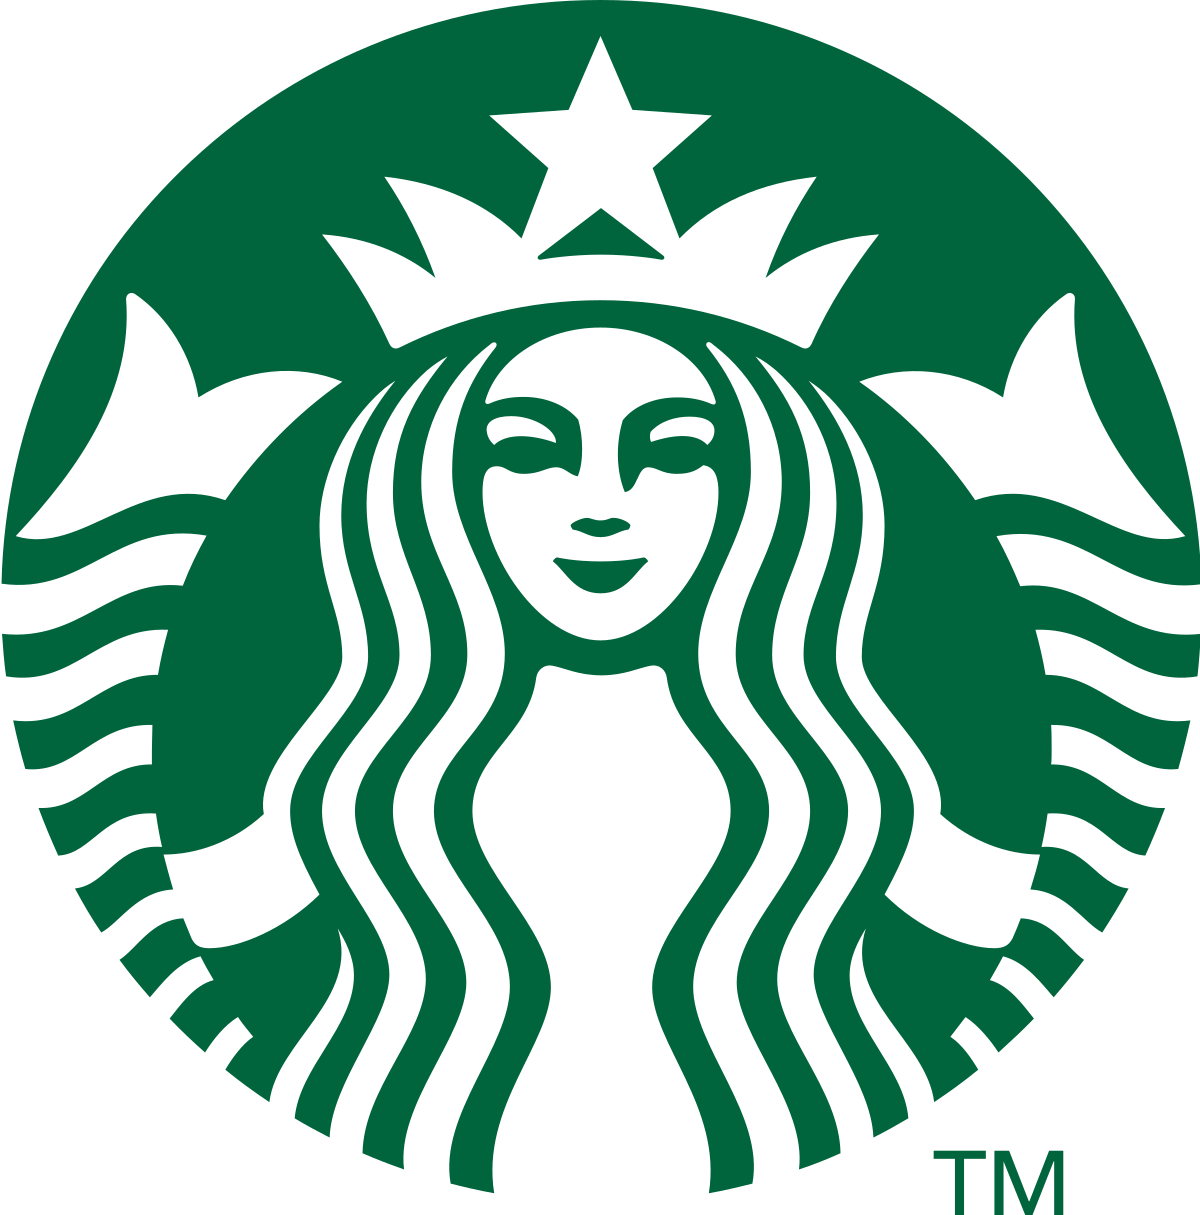 sbucks logo.png